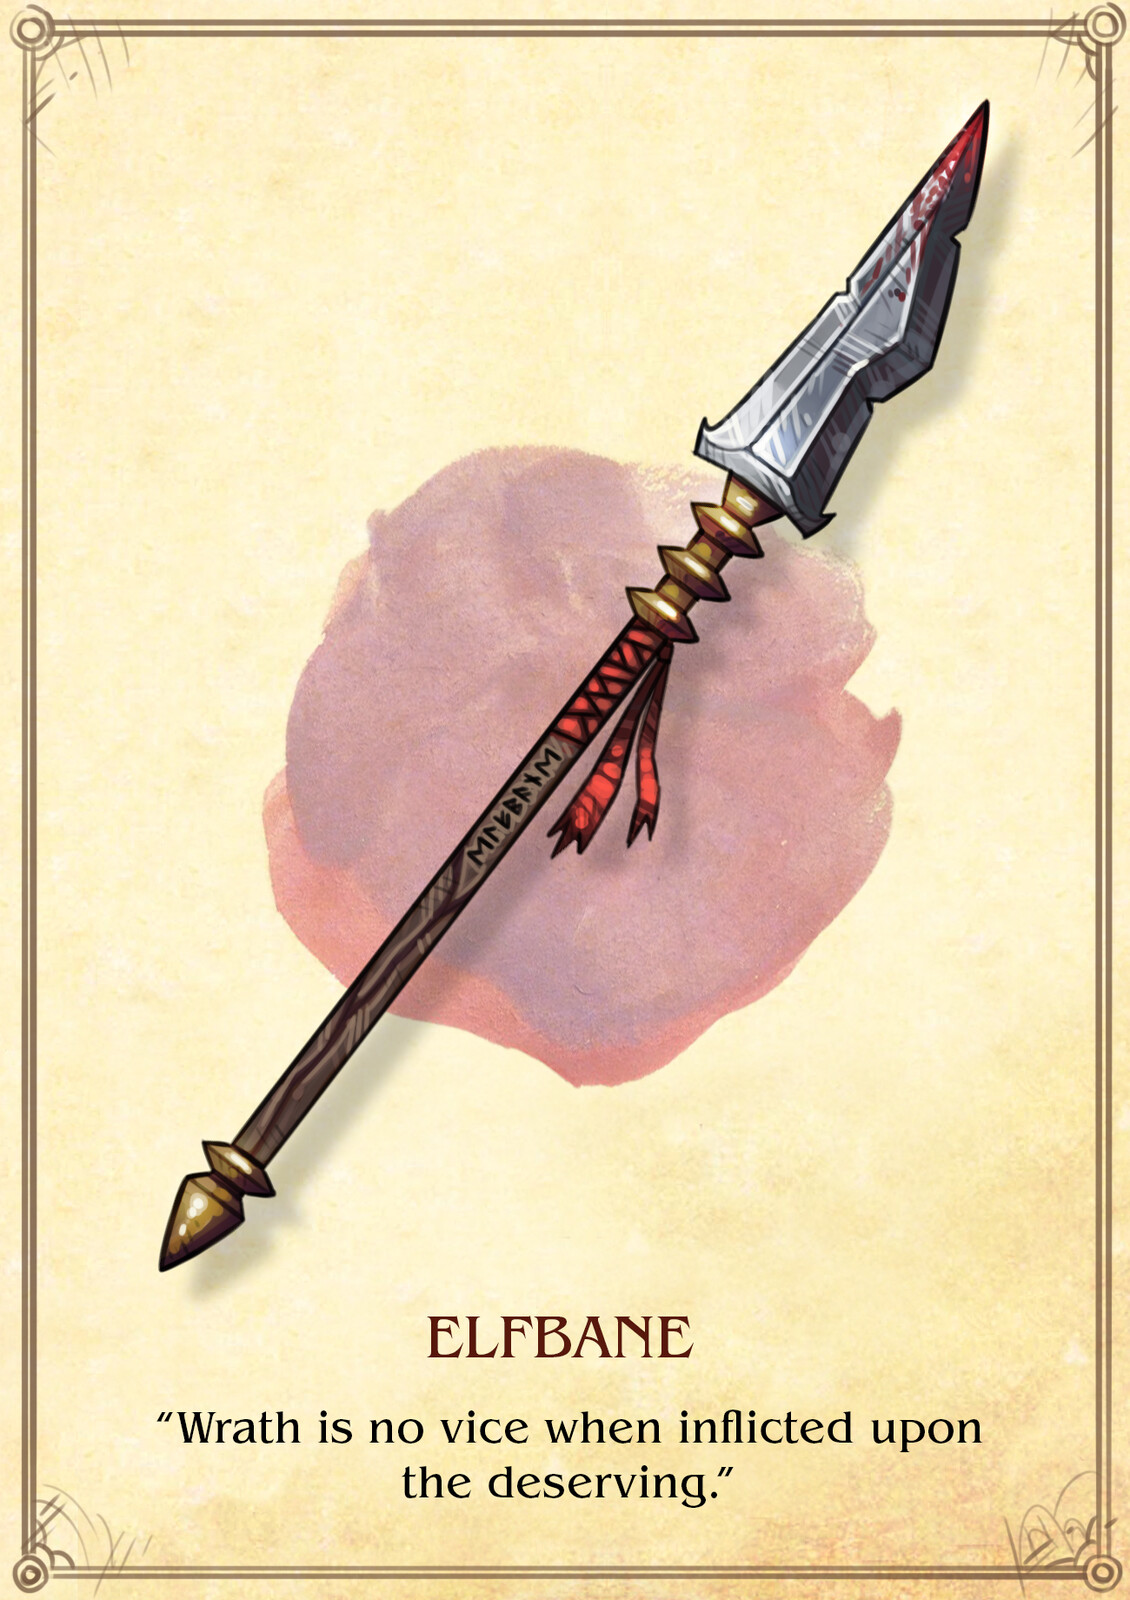 Elfbane